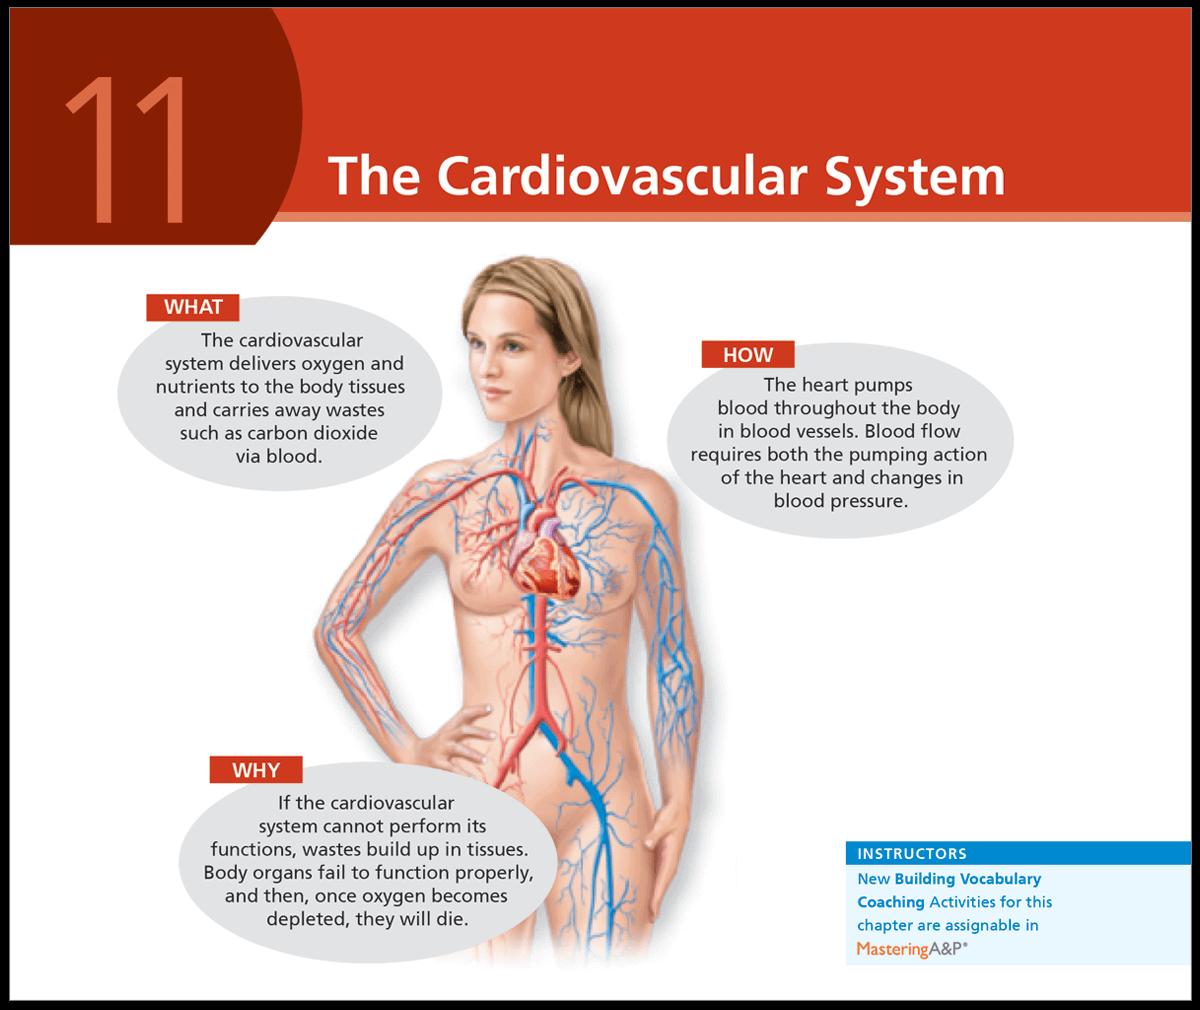 Marieb & Keller, Essentials of Human Anatomy & Physiology